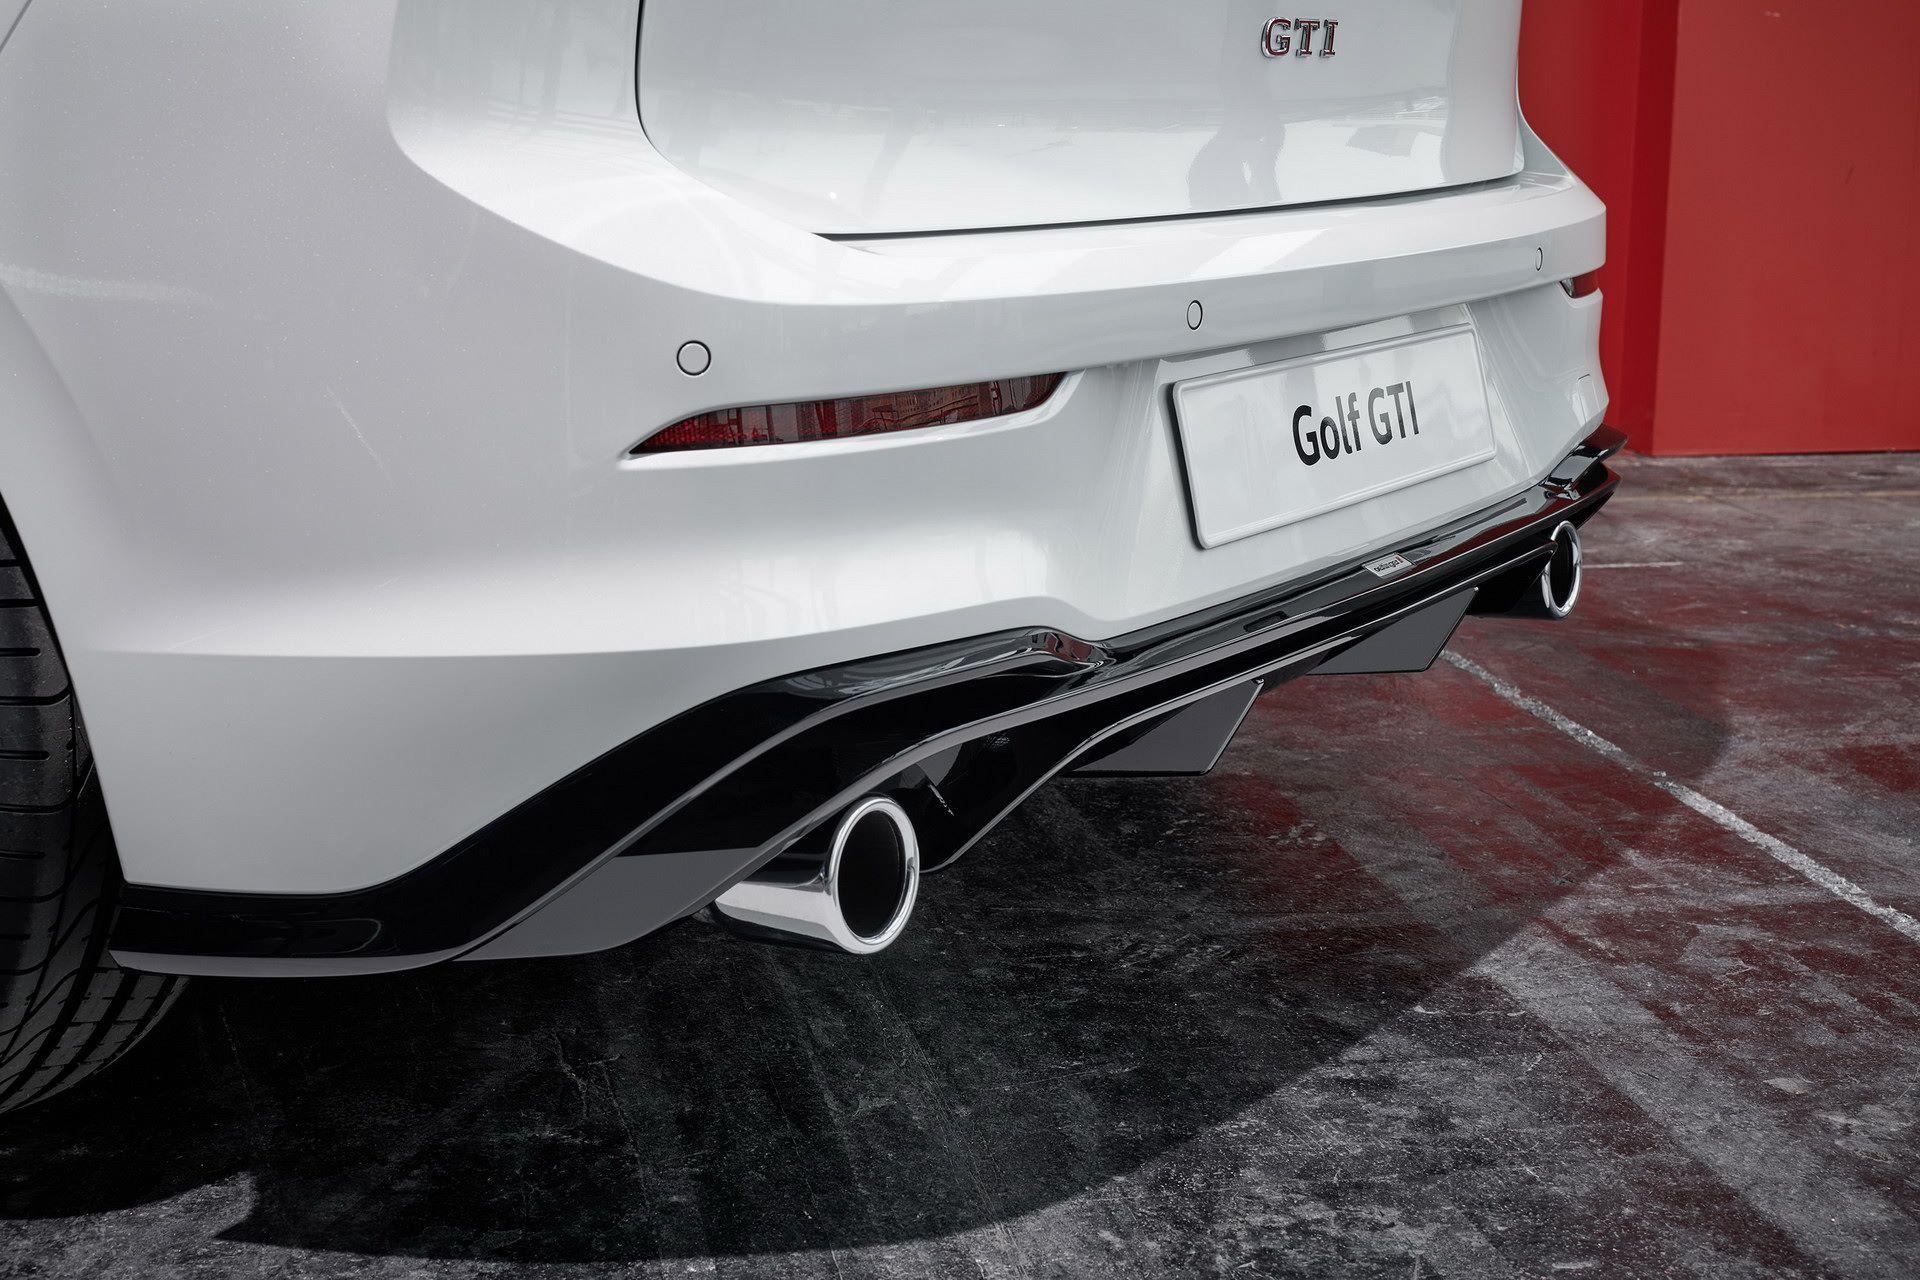 VW-Golf-GTI-By-Oettinger-9